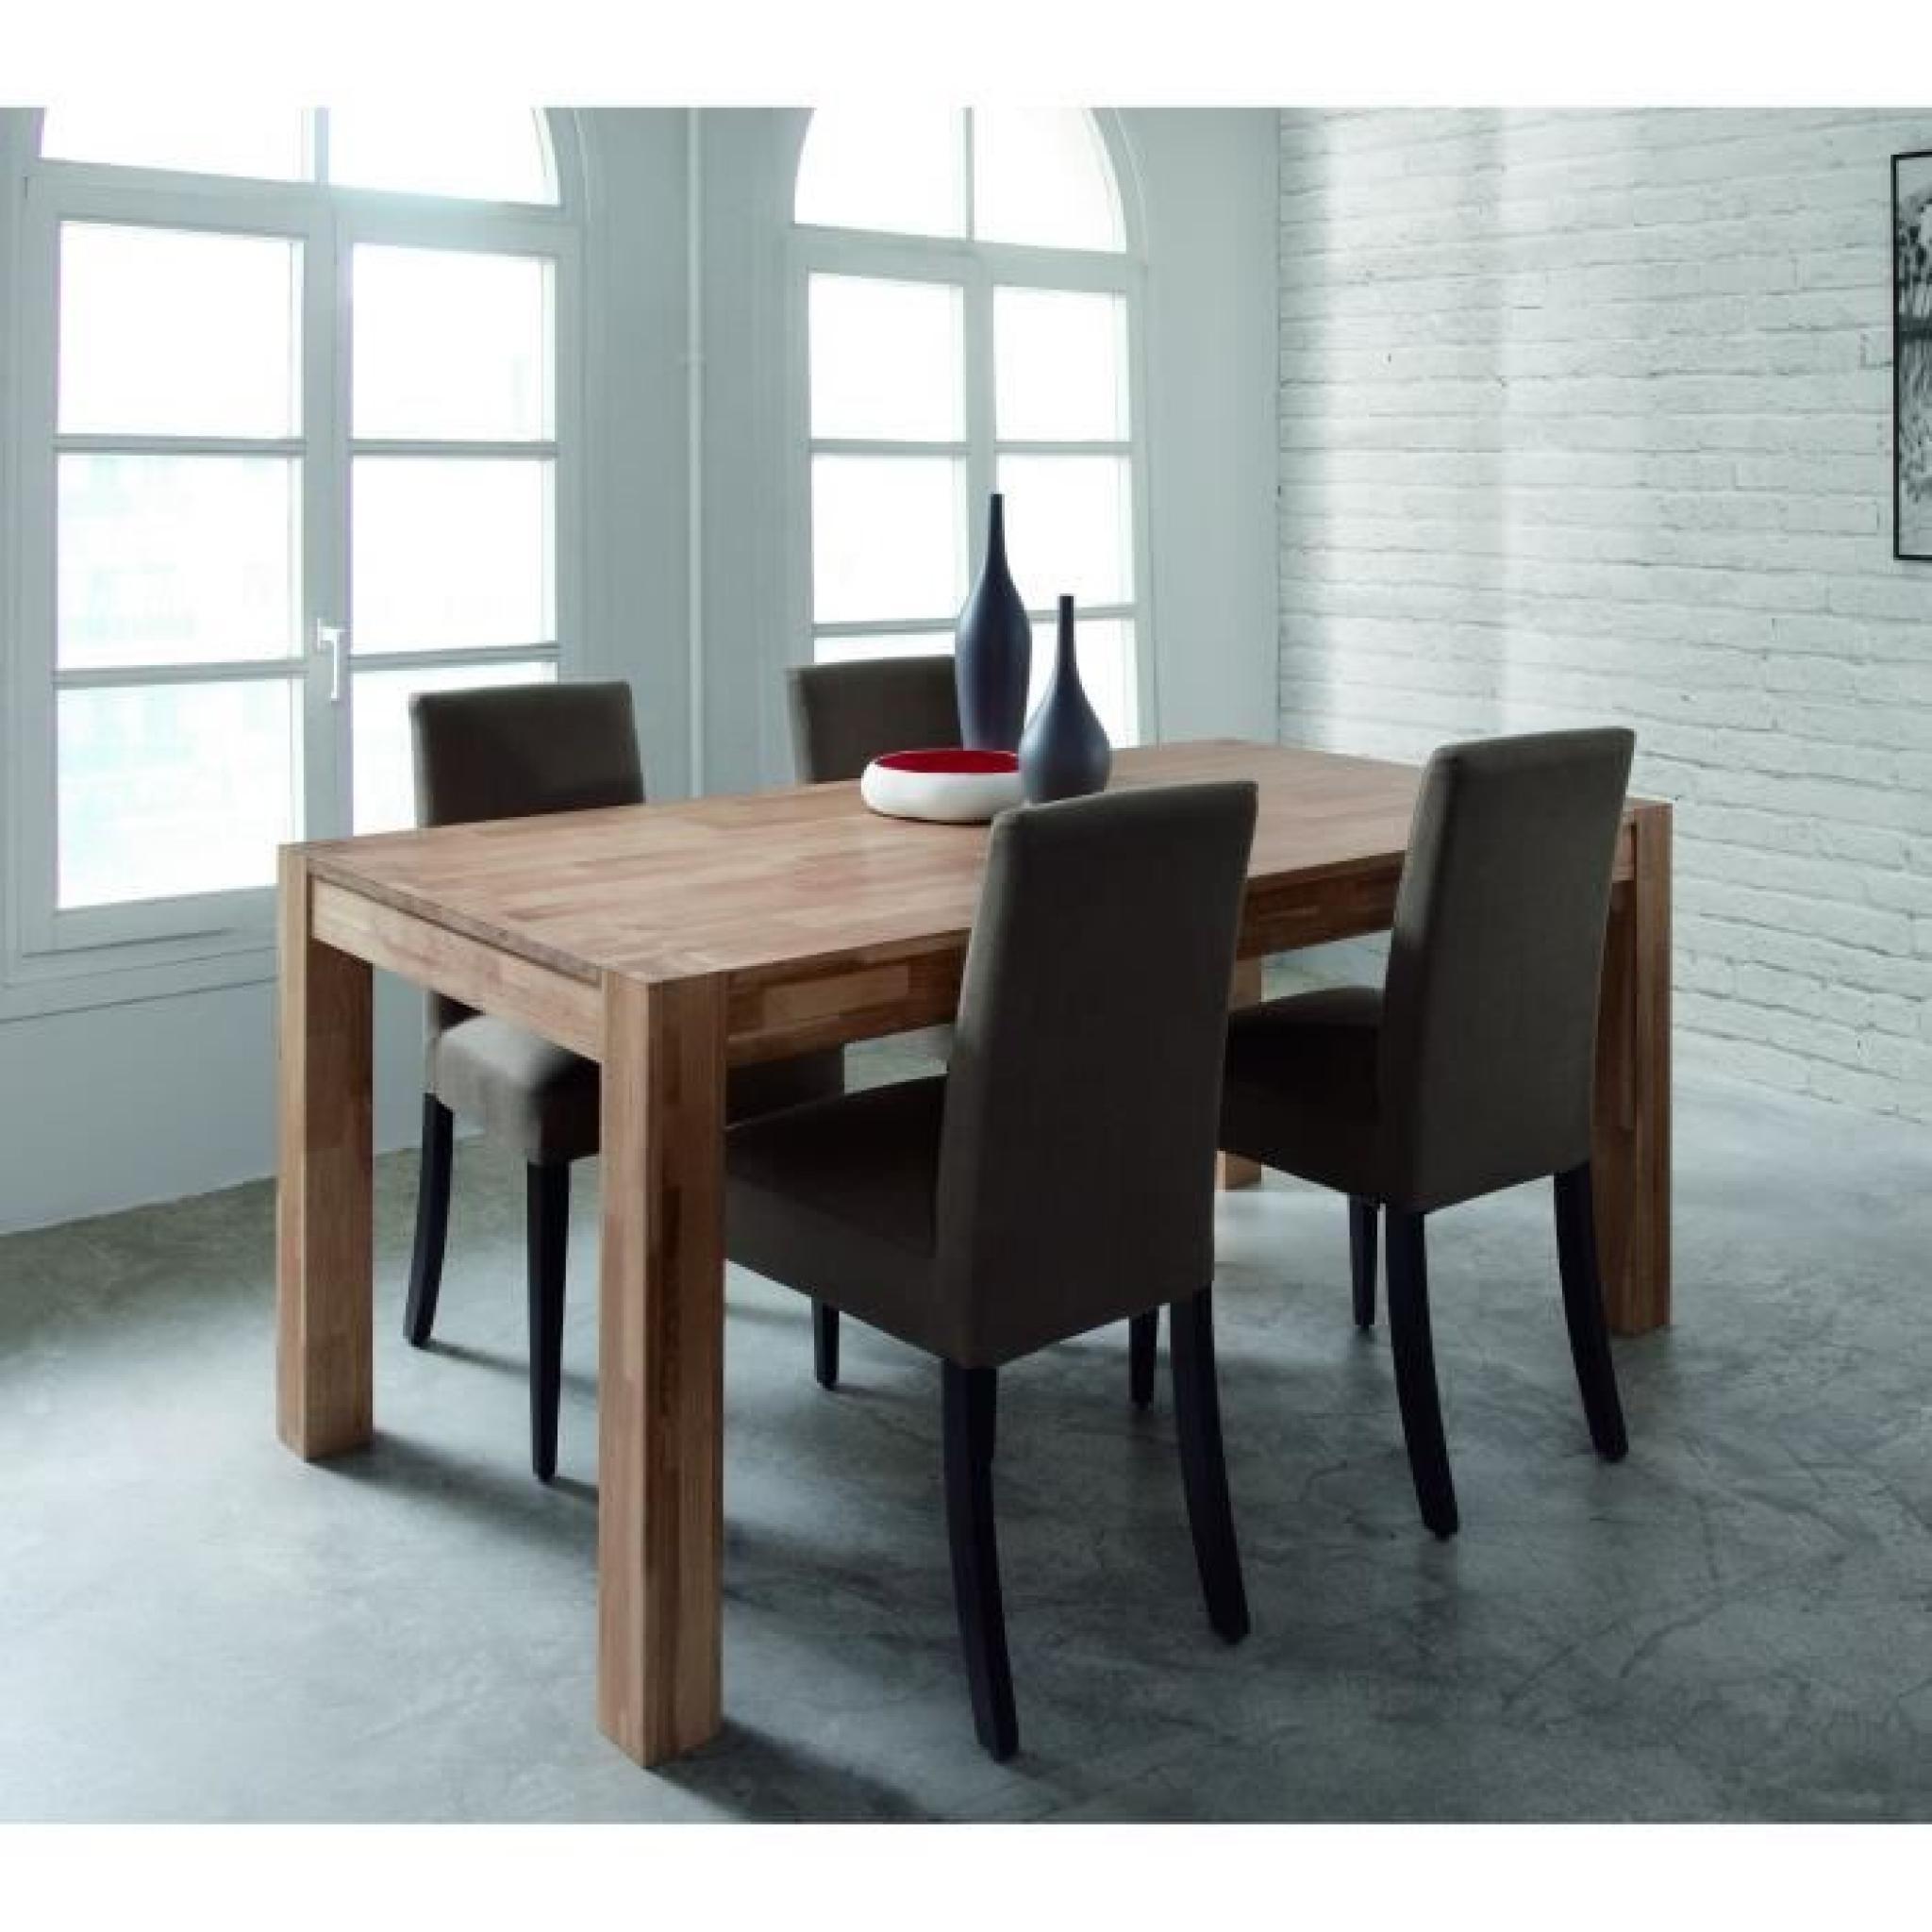 #5D4033 MILES Table Extensible Chêne Massif 150/230cm Achat  5103 salle a manger chene massif pas cher 2048x2048 px @ aertt.com